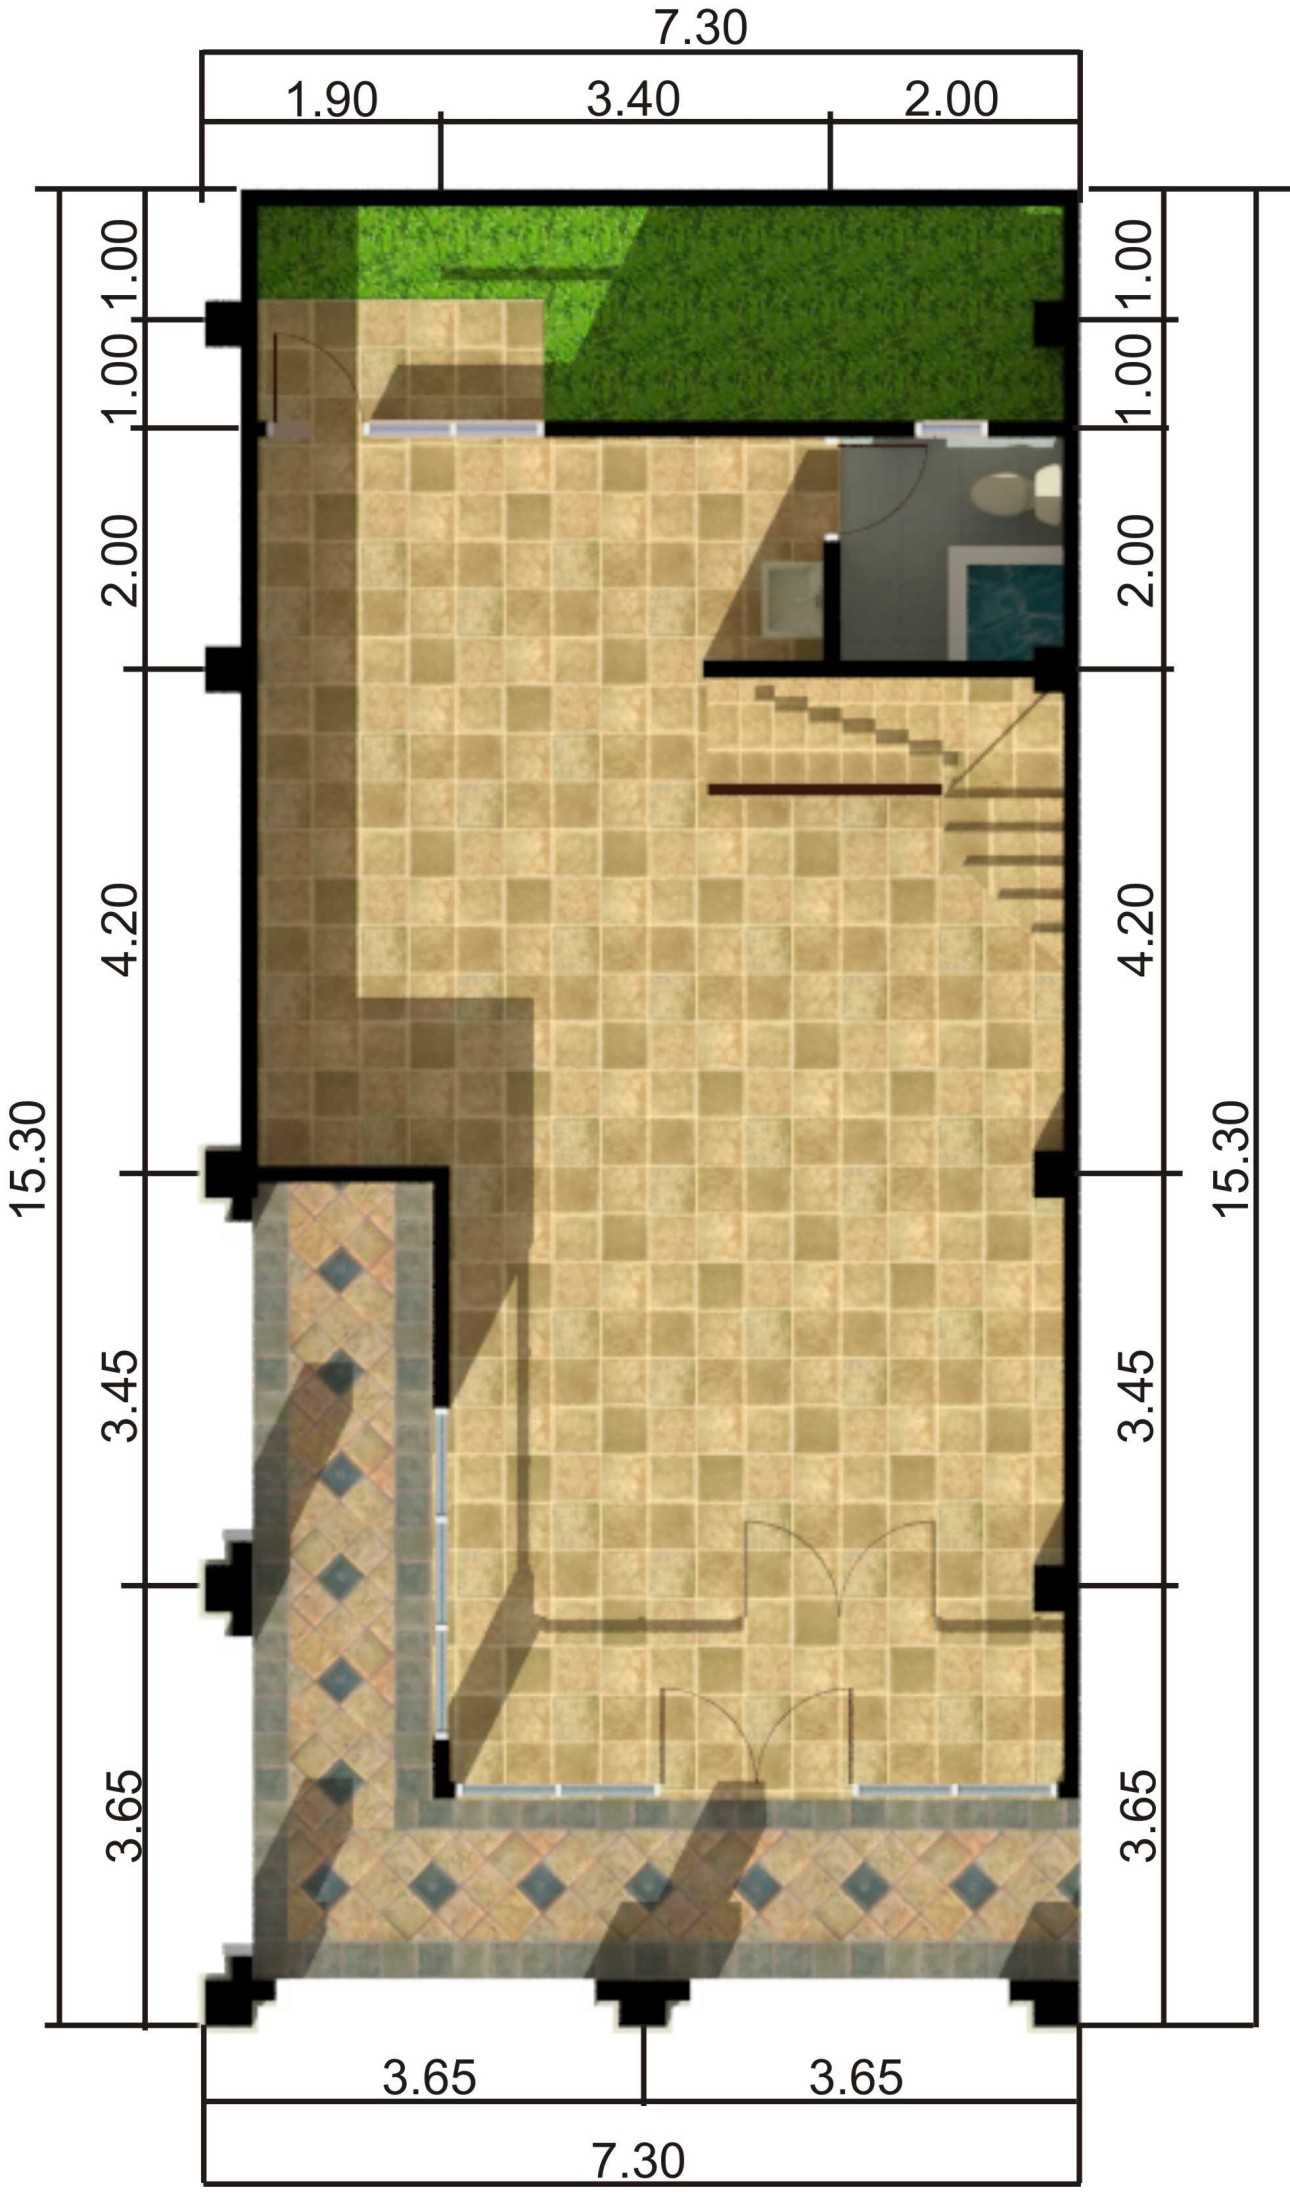 4Linked Architect Ruko Perumahan Majapahit Kabupaten Sidoarjo, Jawa Timur, Indonesia Kabupaten Sidoarjo, Jawa Timur, Indonesia 4Linked-Architect-Ruko-Perumahan-Majapahit  75199